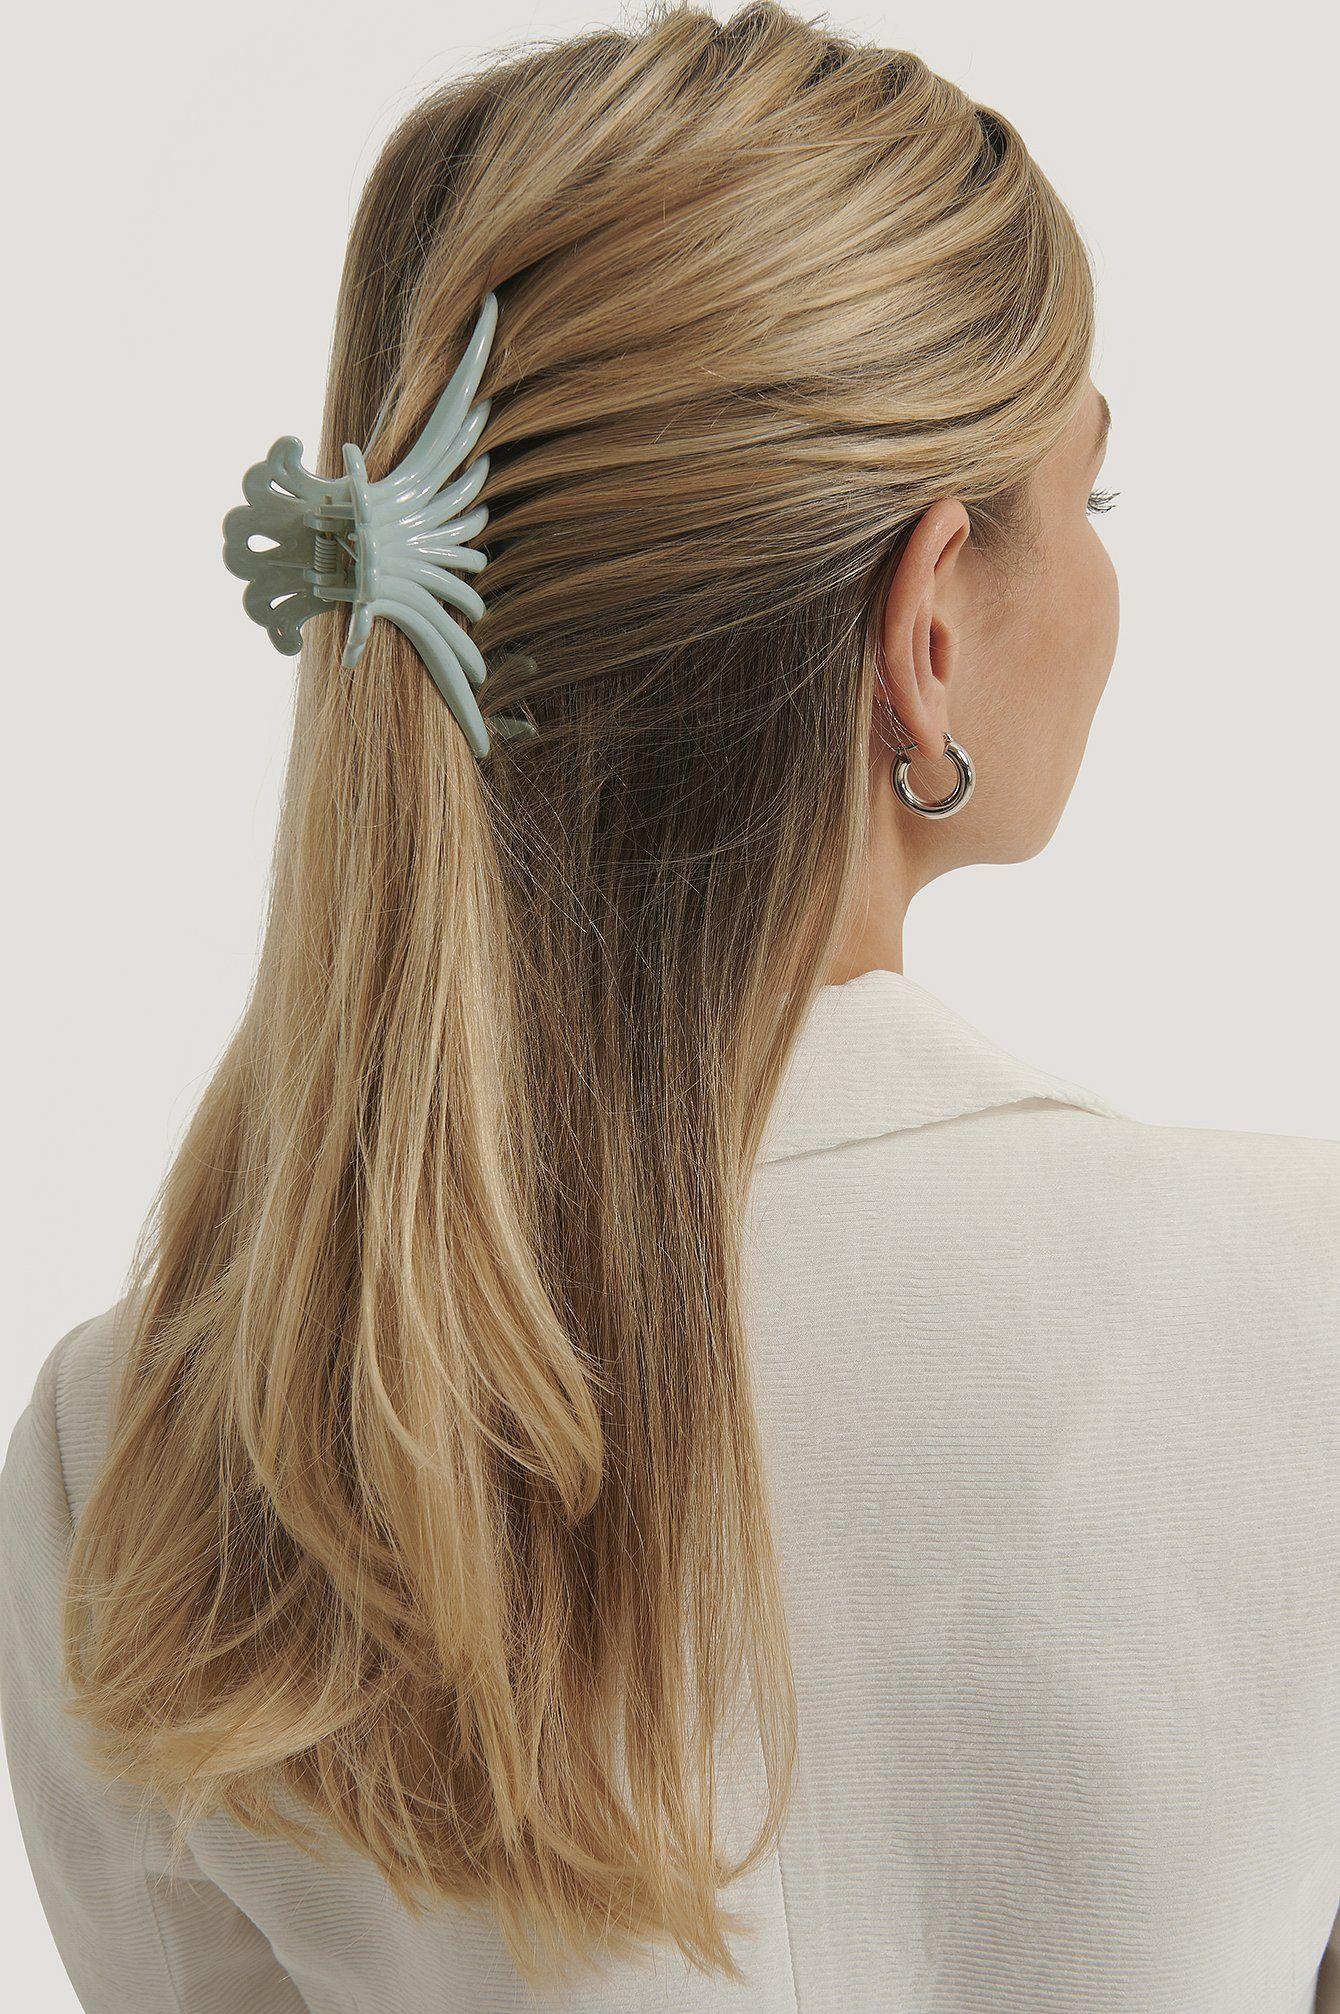 Grosse Oktopus Haarspange Blau In 2020 Haar Styling Haare Lange Gerade Frisuren